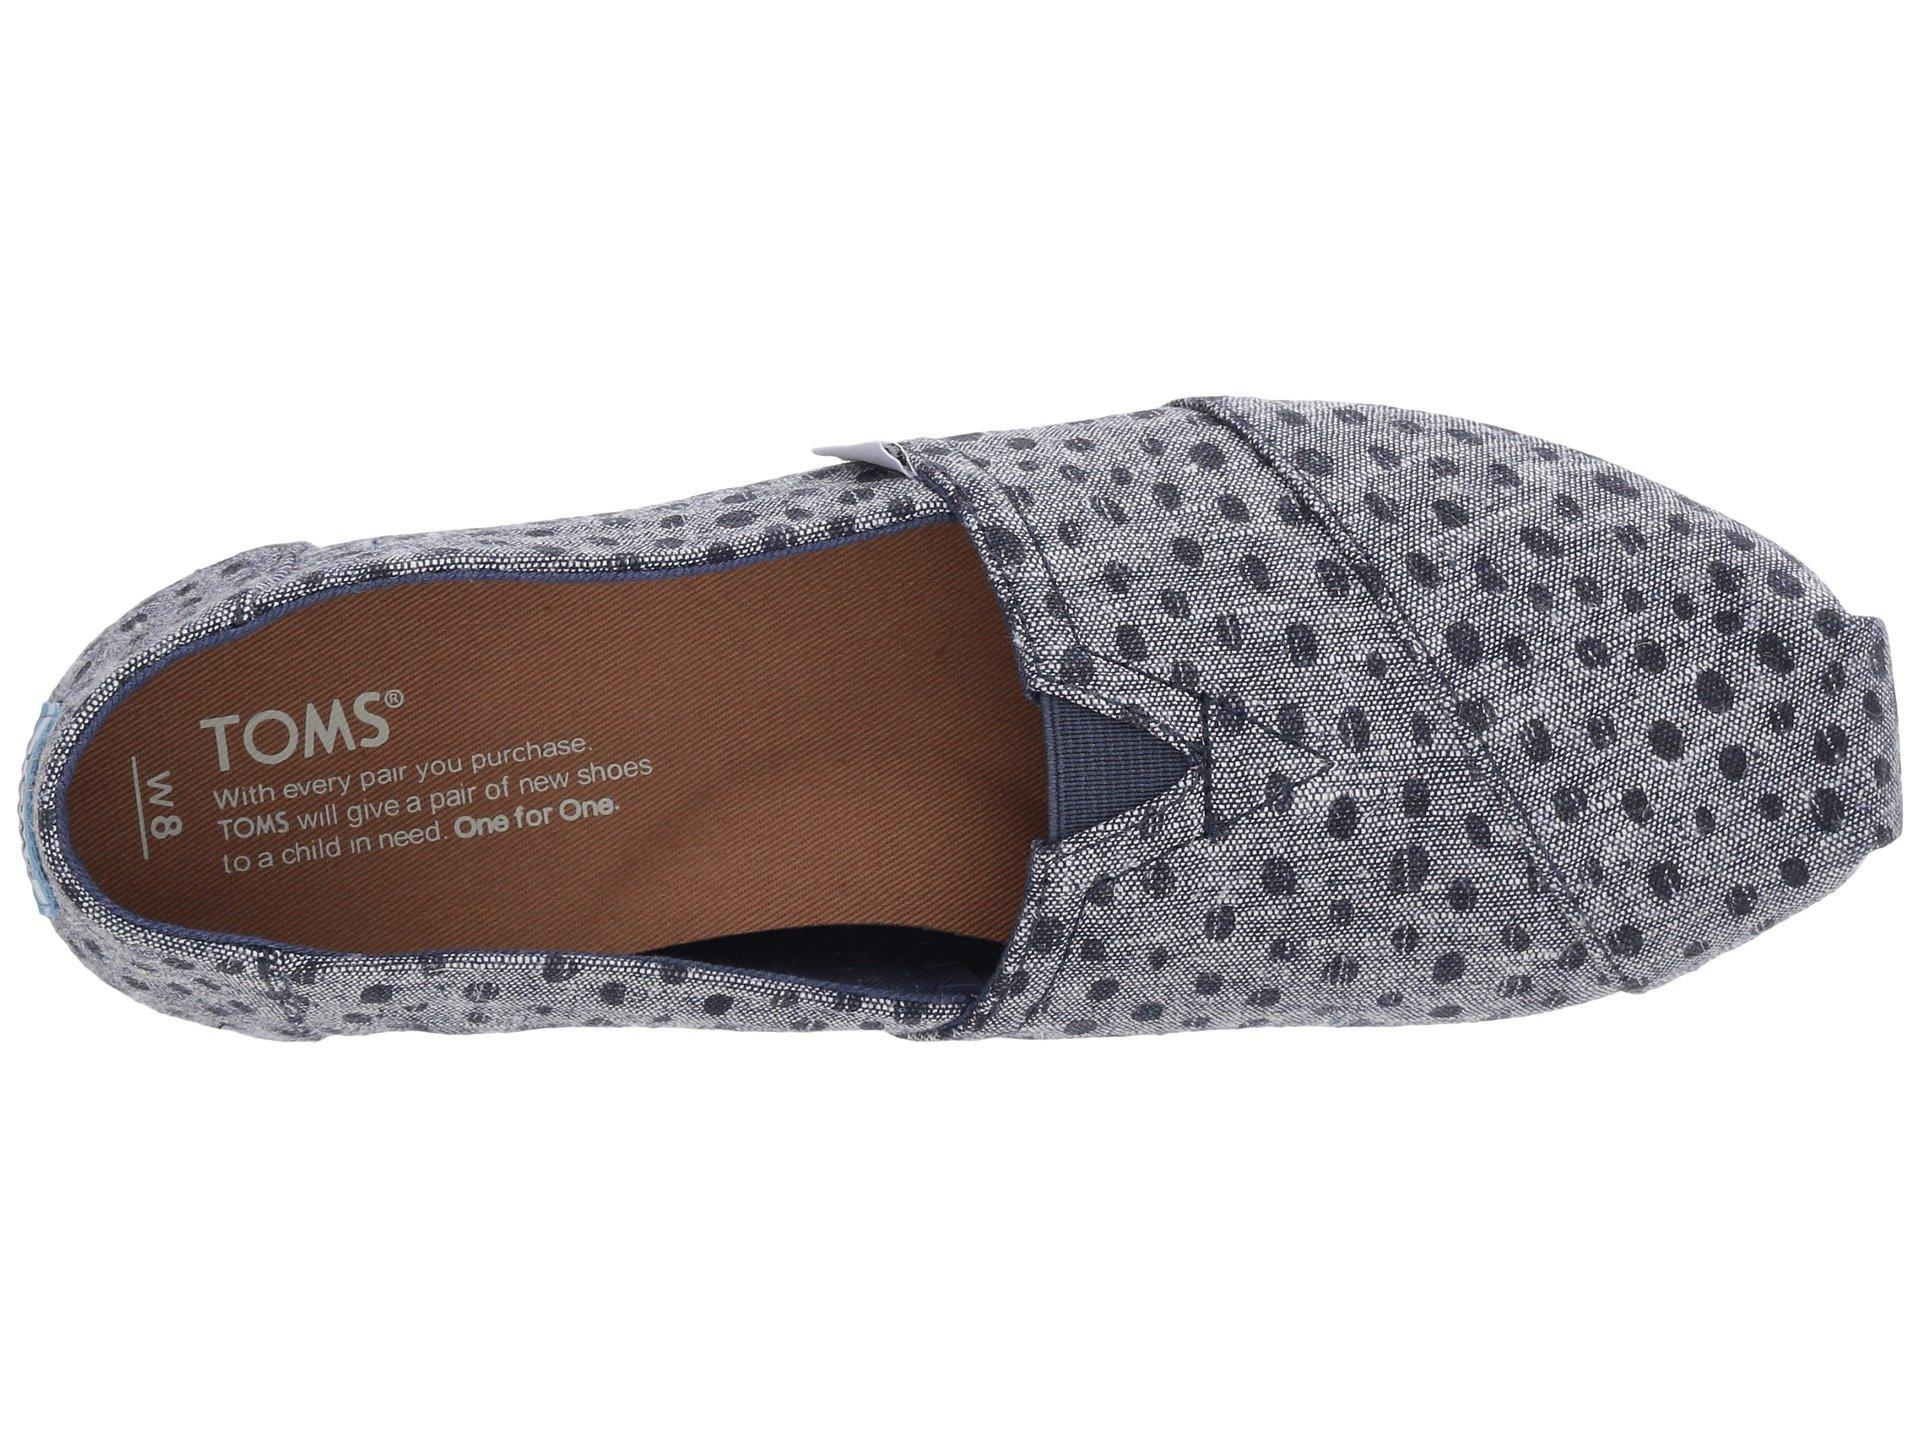 838f5e50d5b 6 Pm Shoes Toms - Style Guru  Fashion